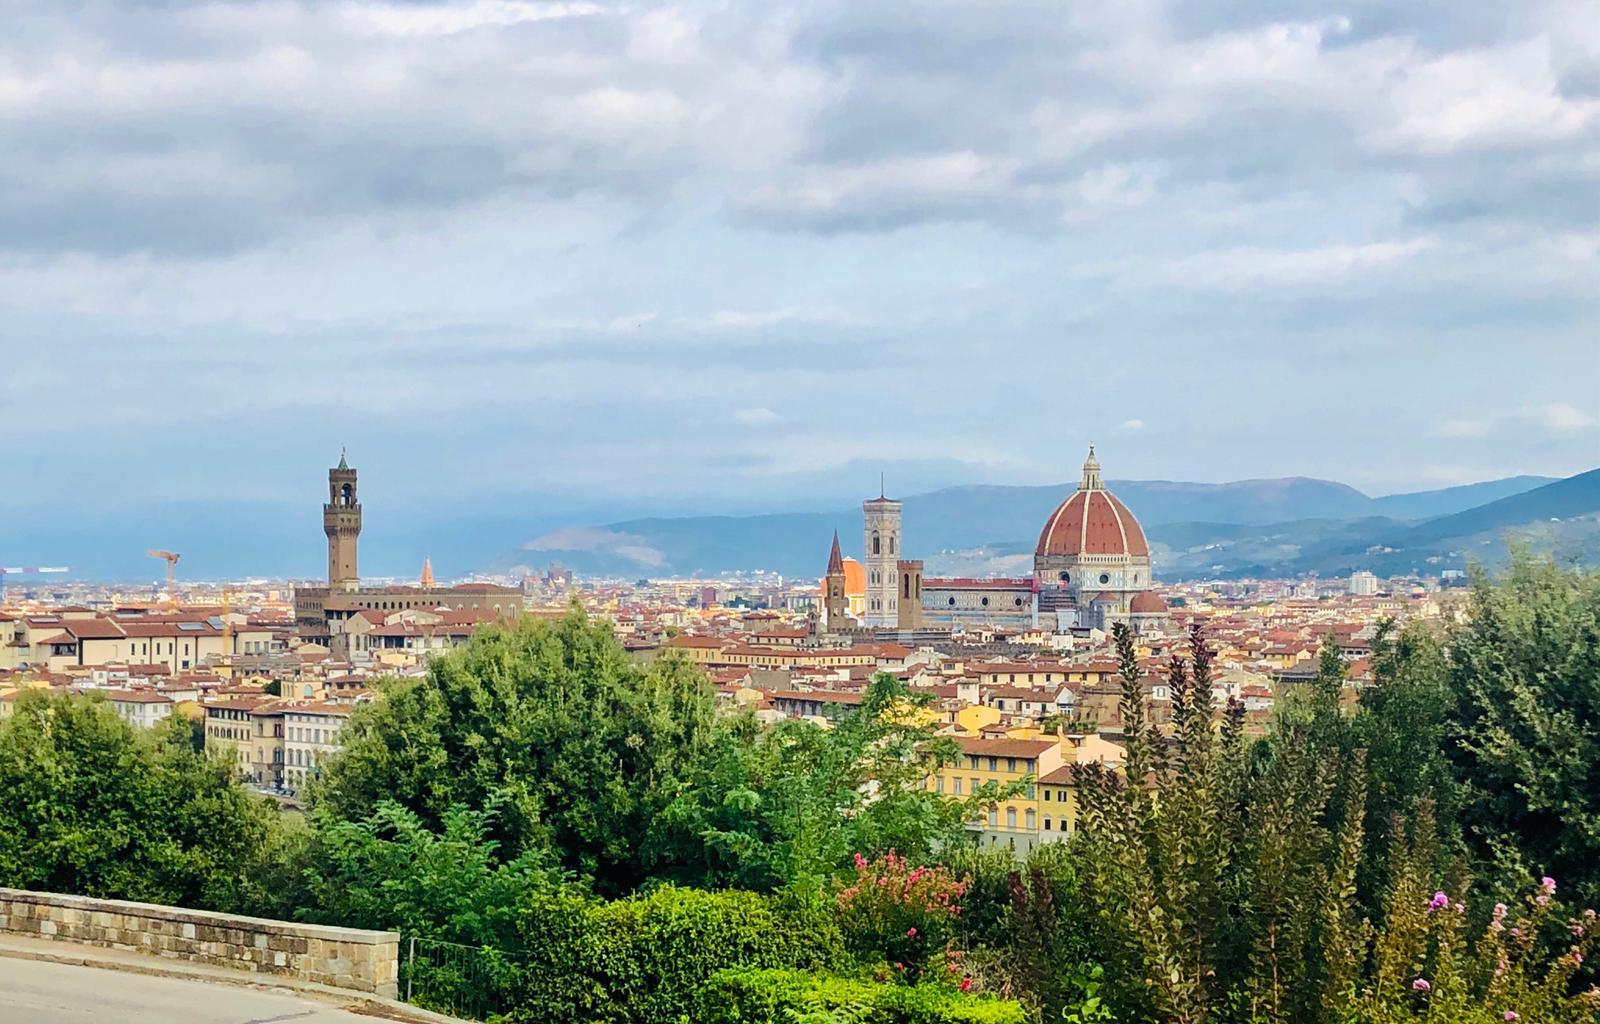 Coordinamento regionale a porte aperte a Firenze 31